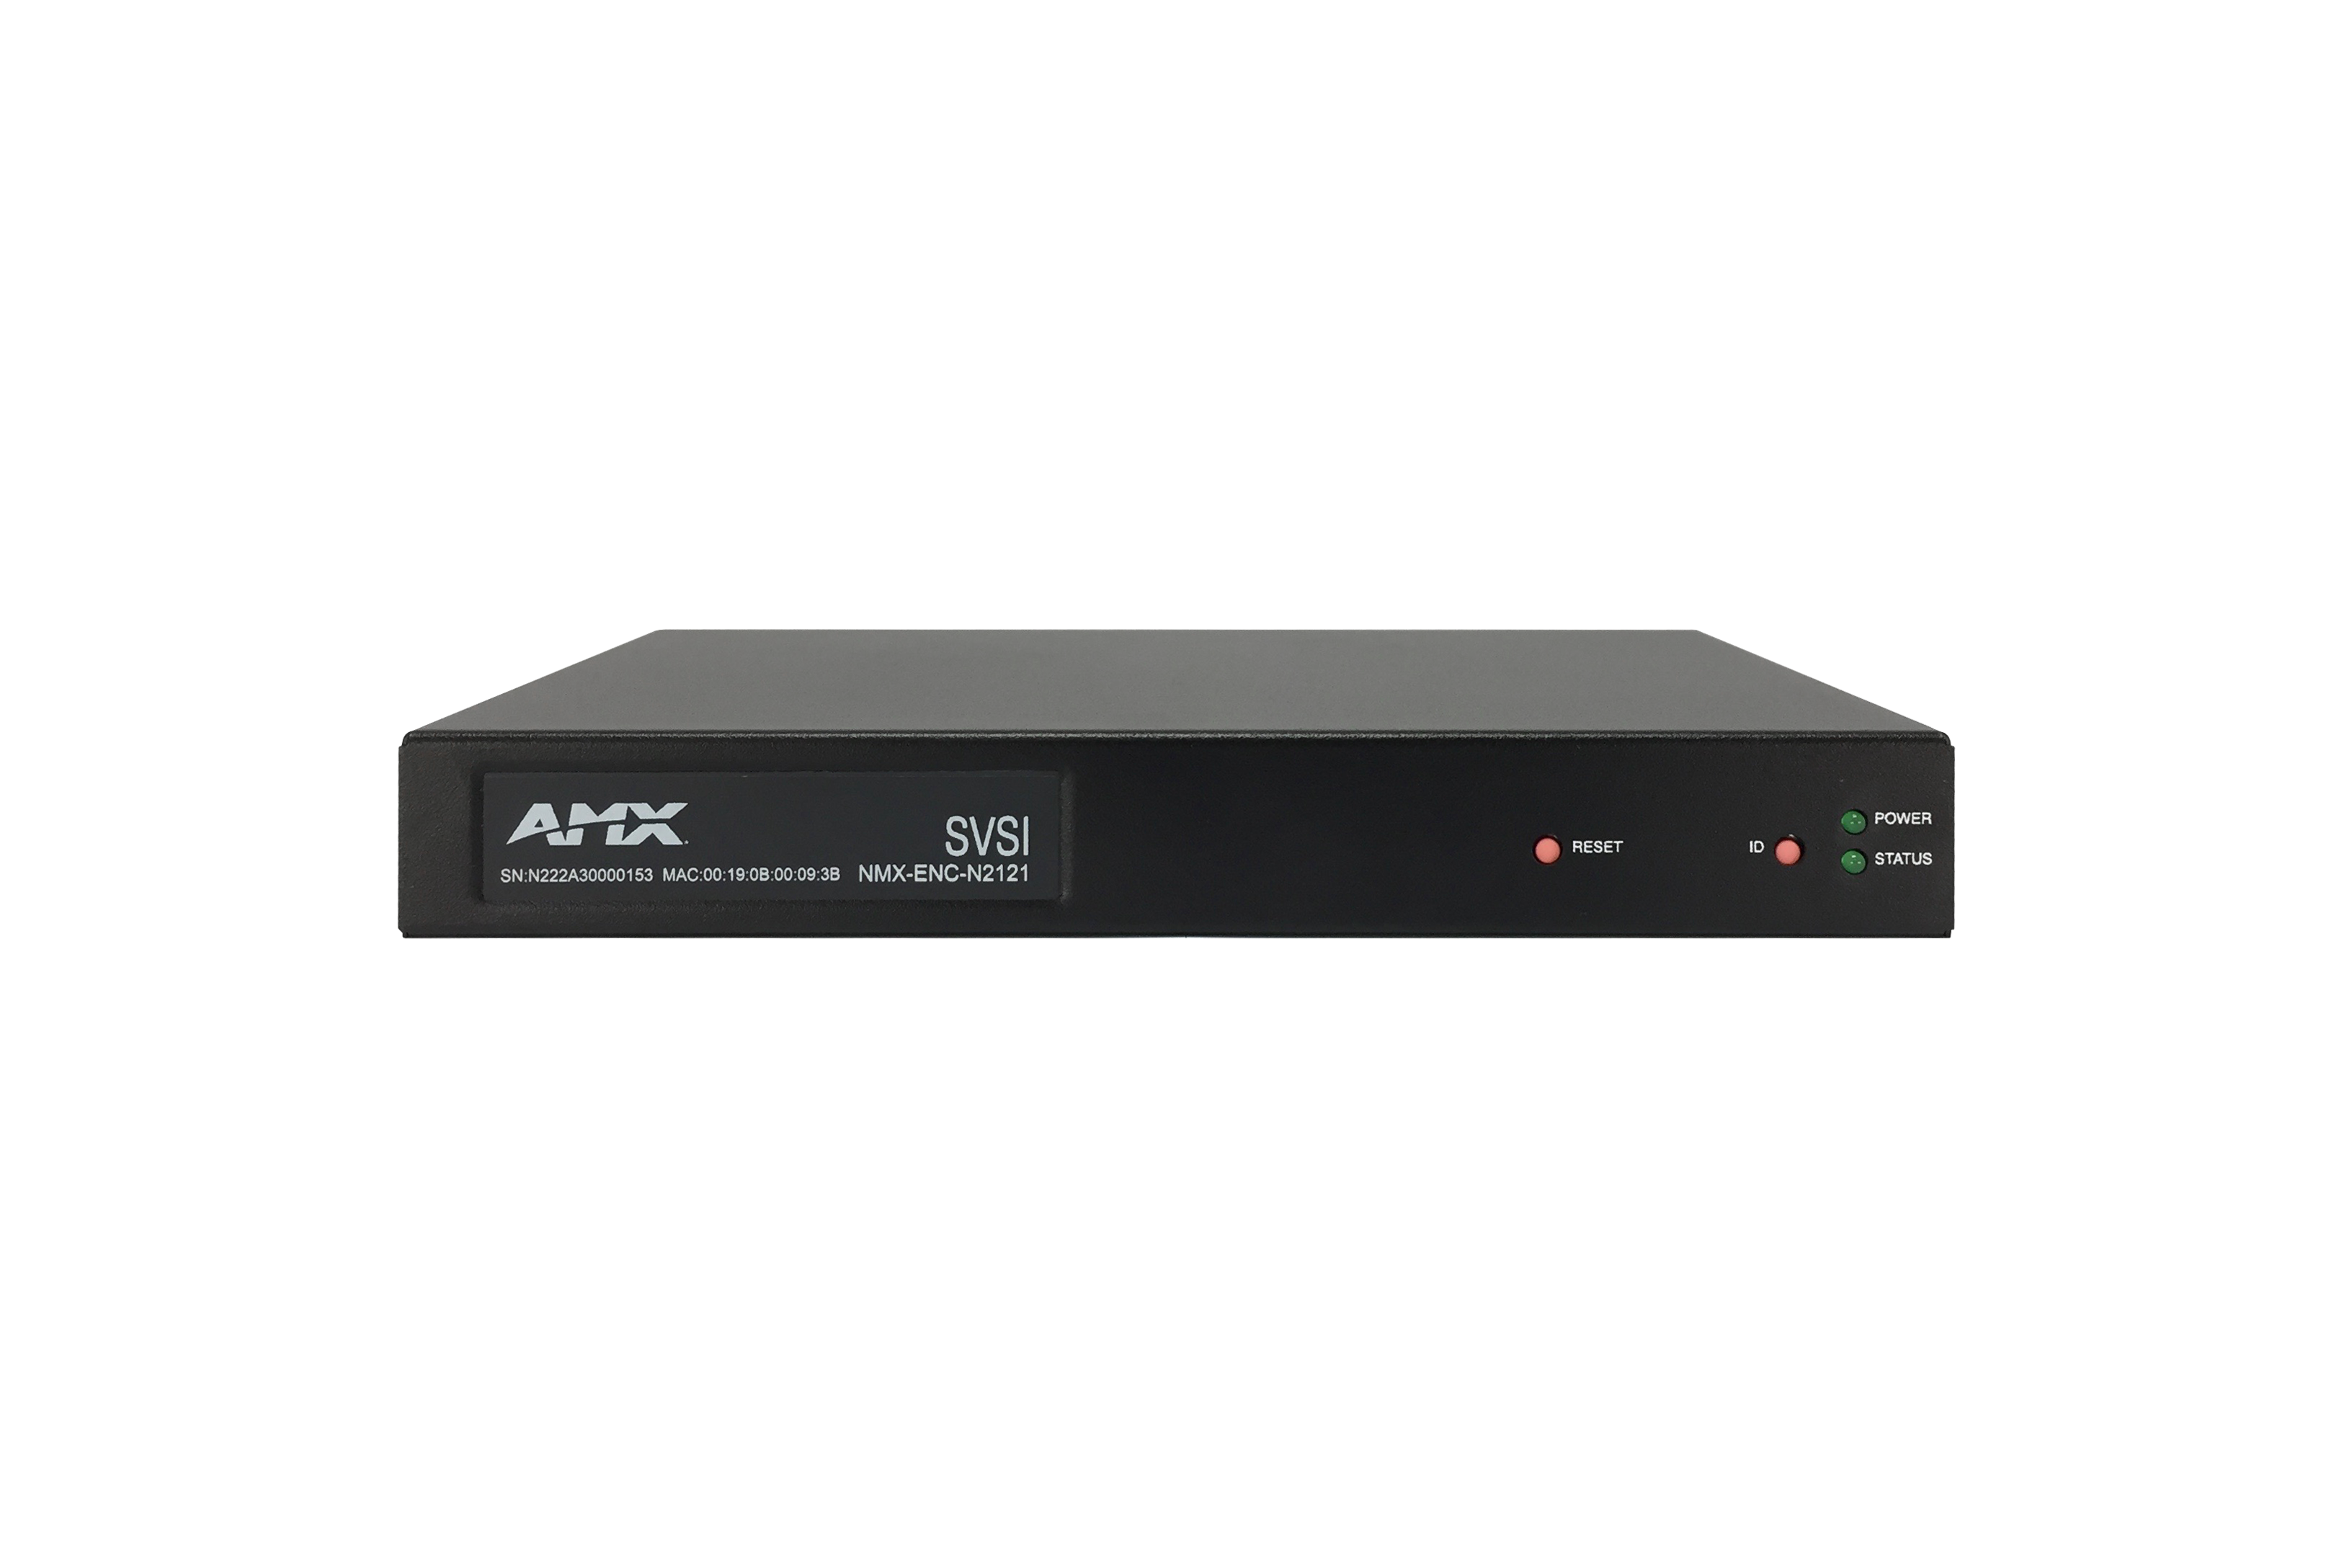 NMX-ENC-N2121 Front High